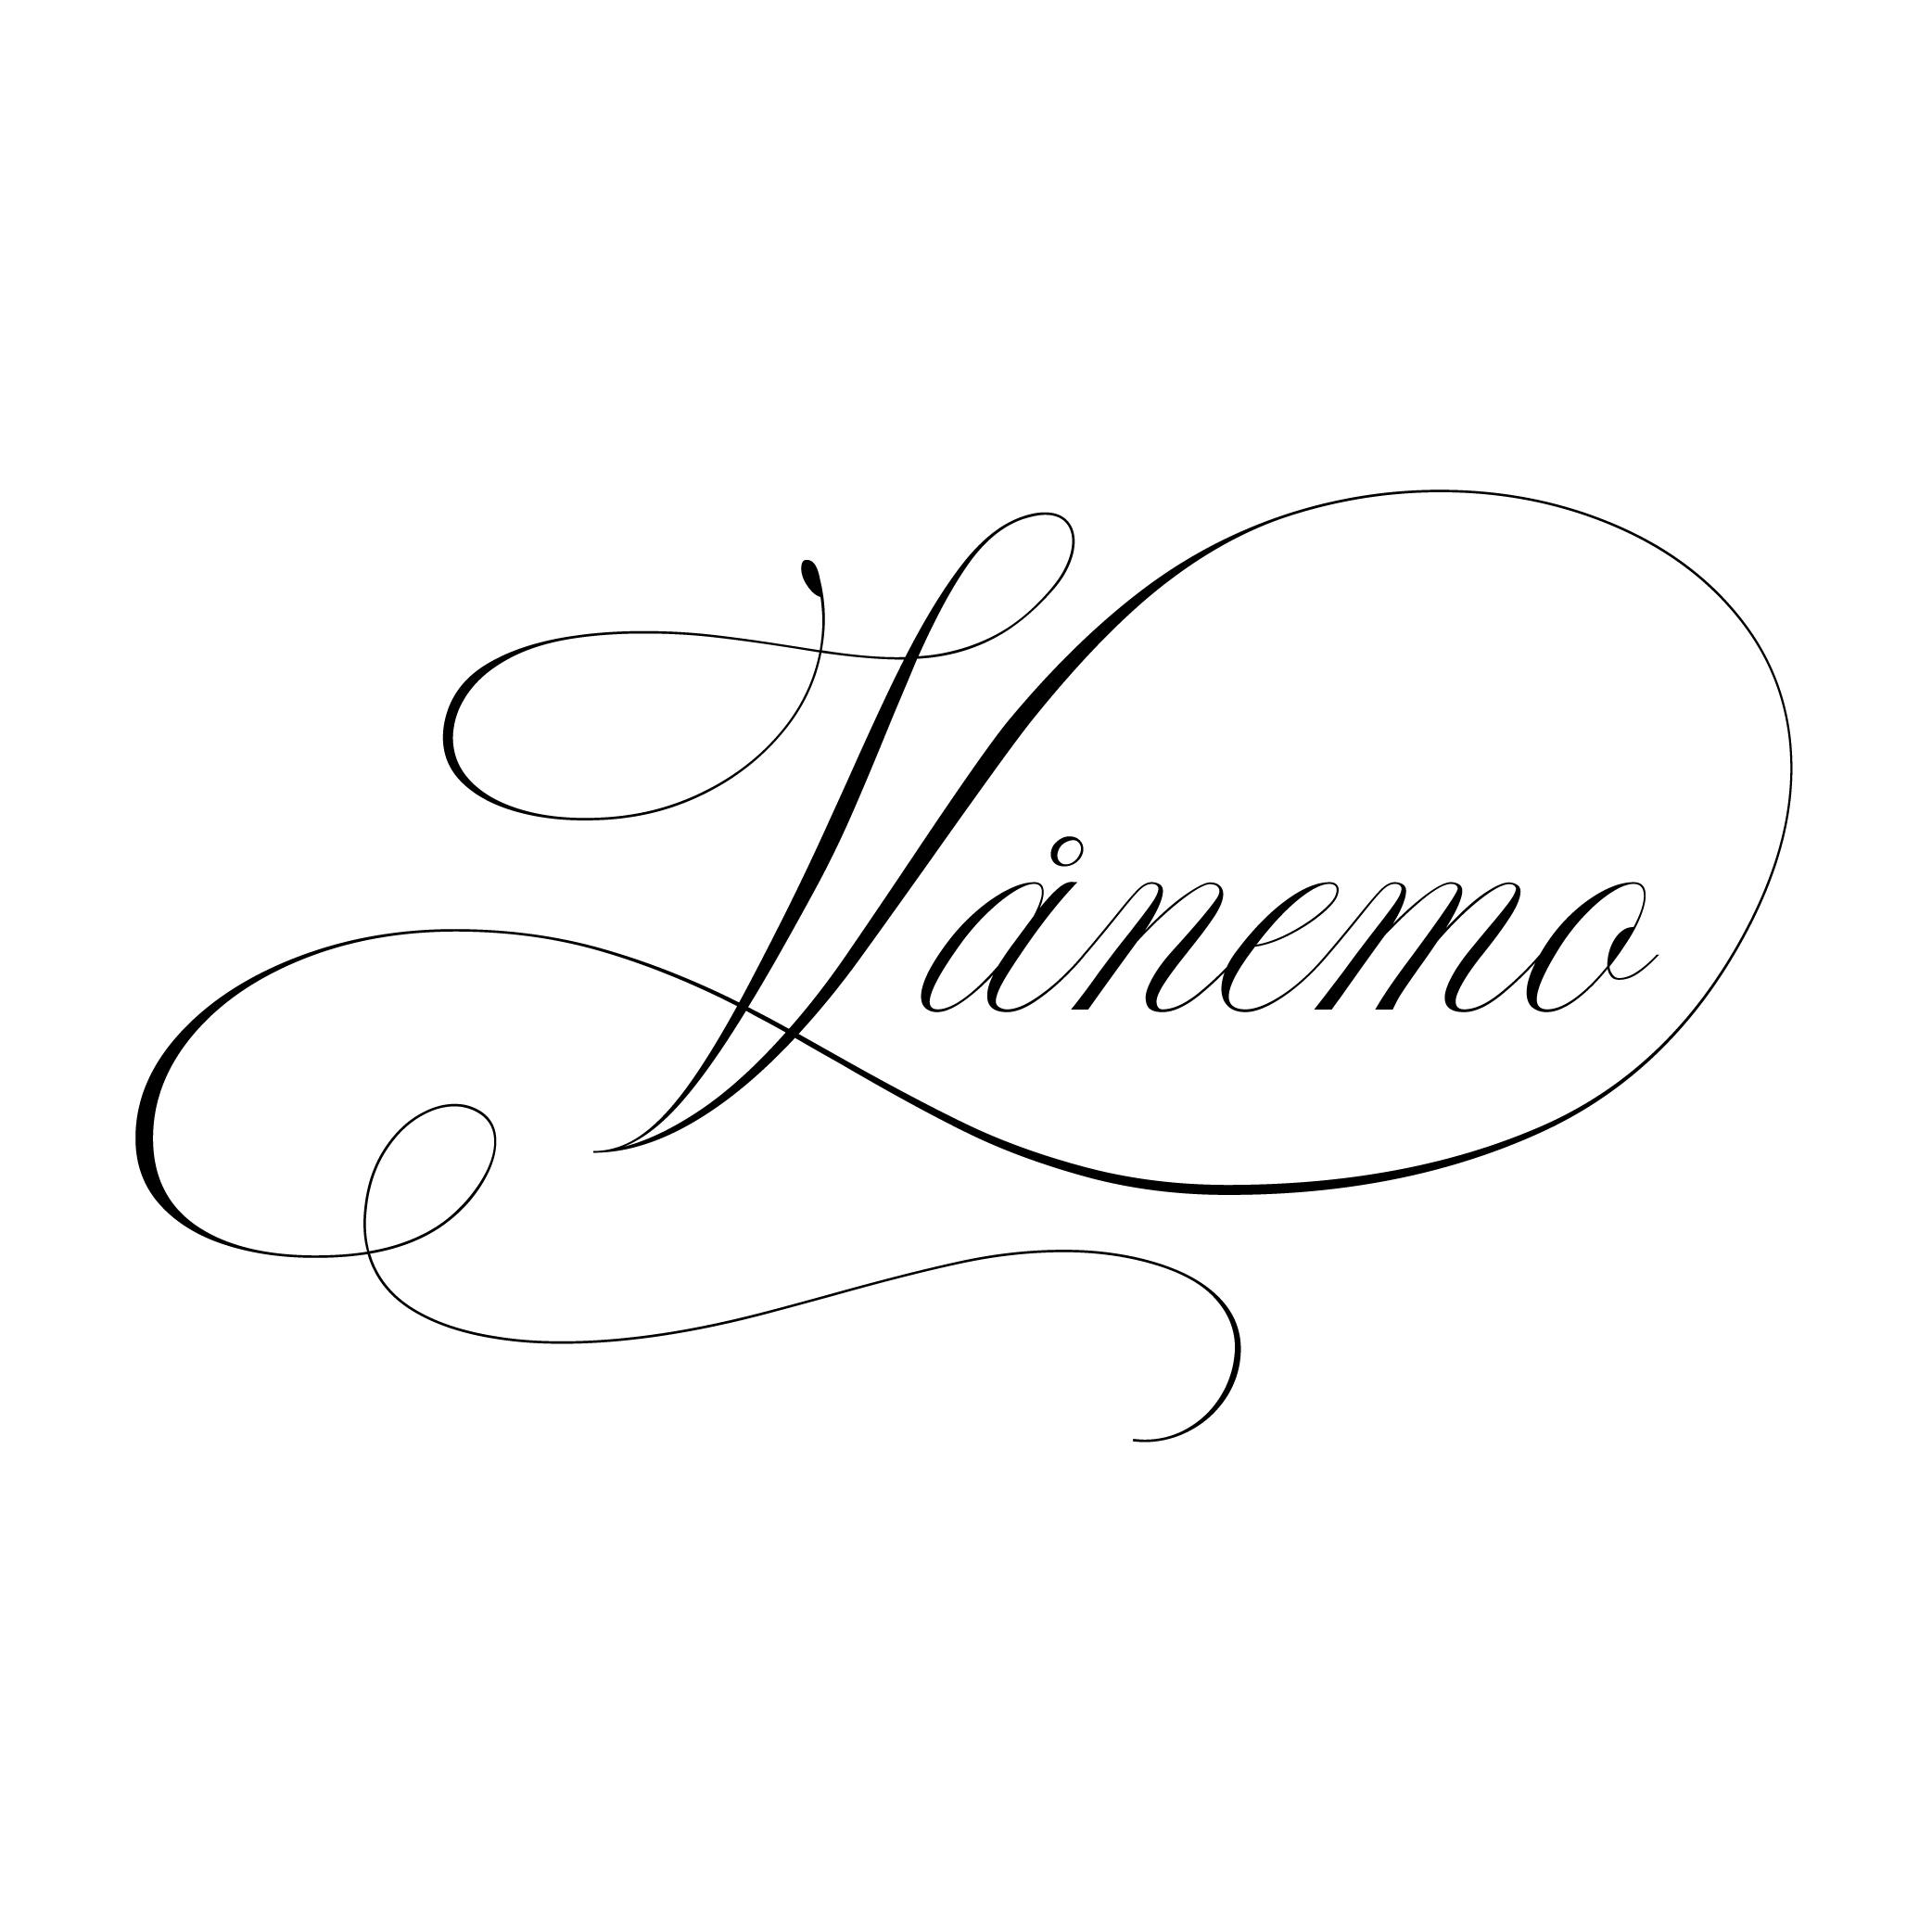 Fotograf Lizette Vånemo Logotyp